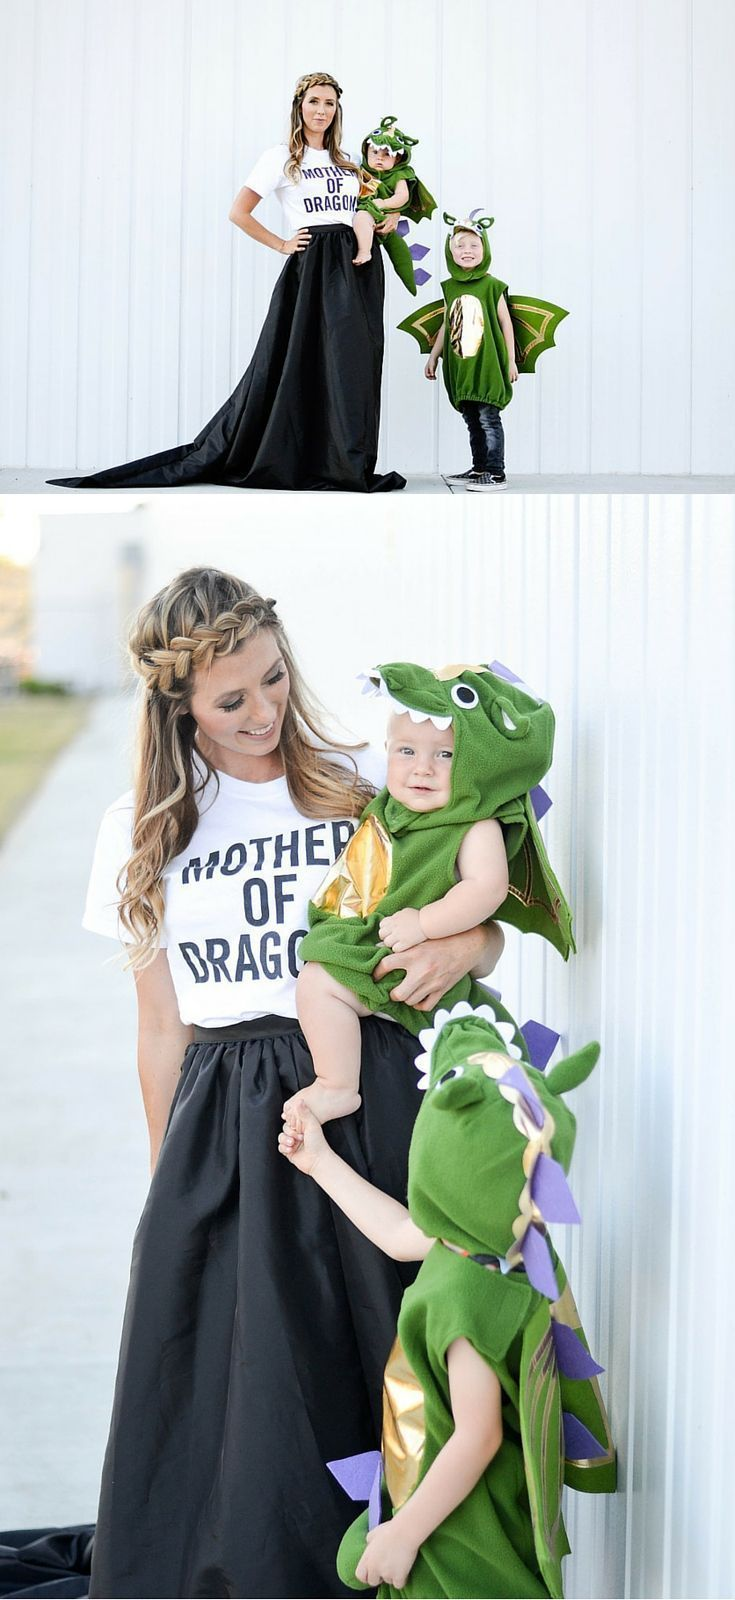 Creative Mom and Kid Halloween Costumes - Mother of Dragons and Baby Dragons #halloweencostumekids #diyhalloweencostumes